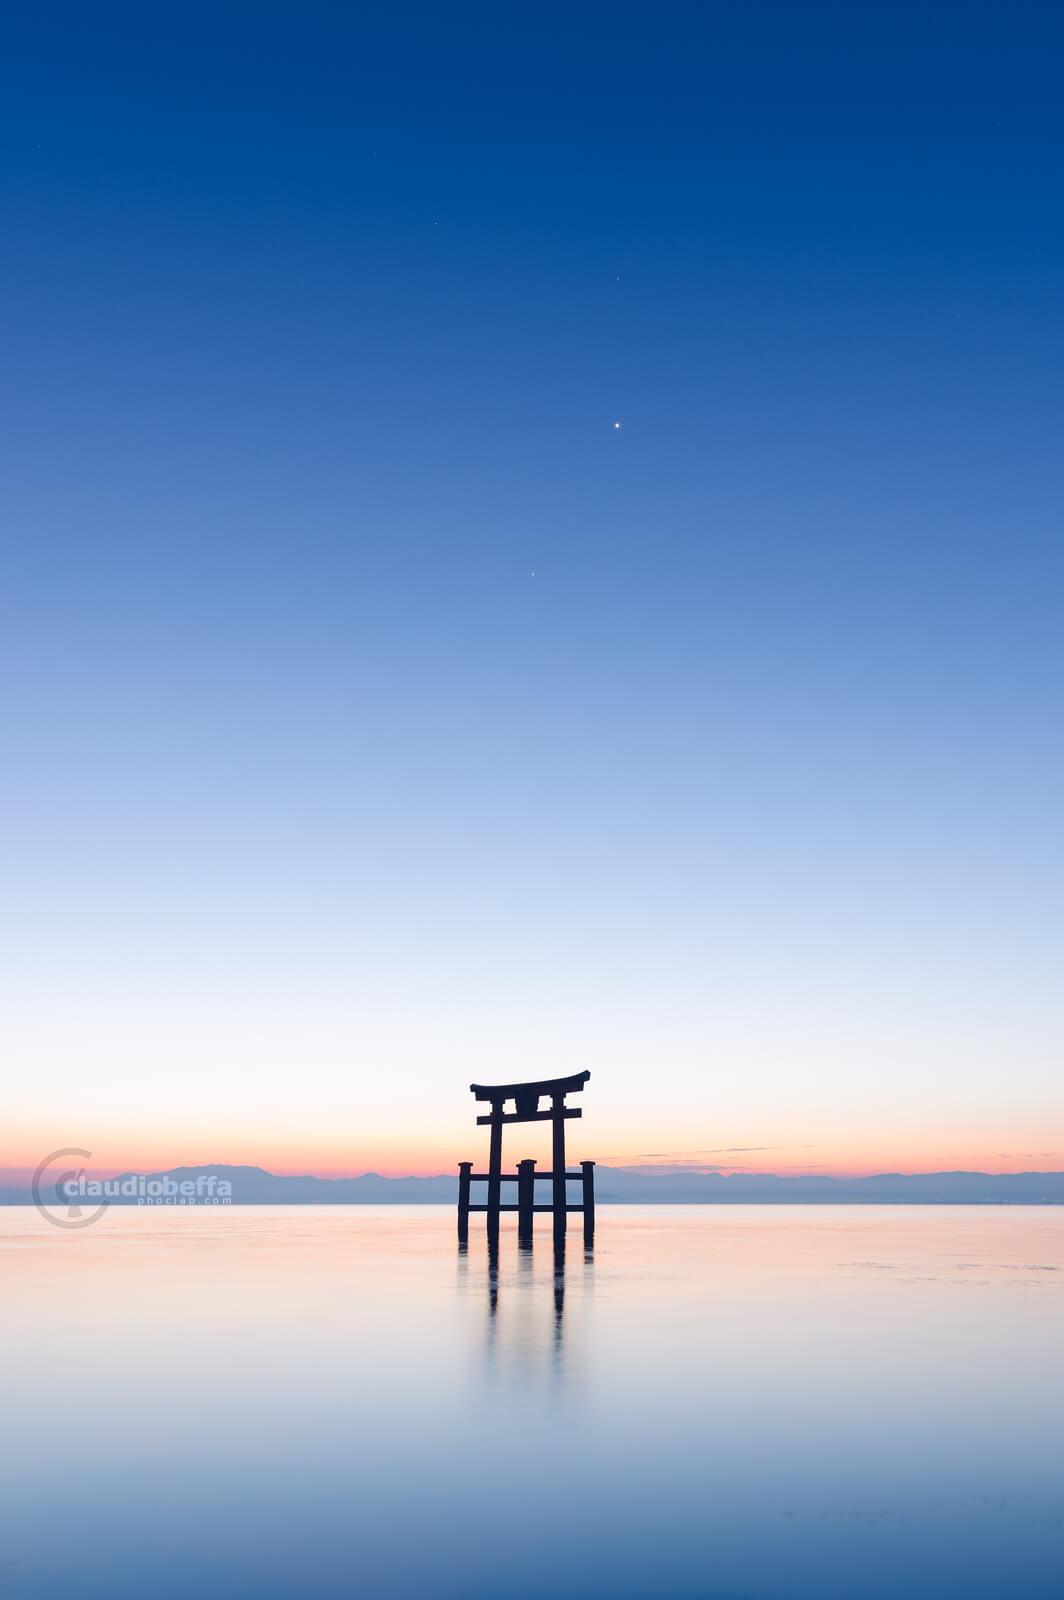 Gate to the stars, Gate, Torii, Shinto, Sunrise, Light, Stars, Water, Reflections